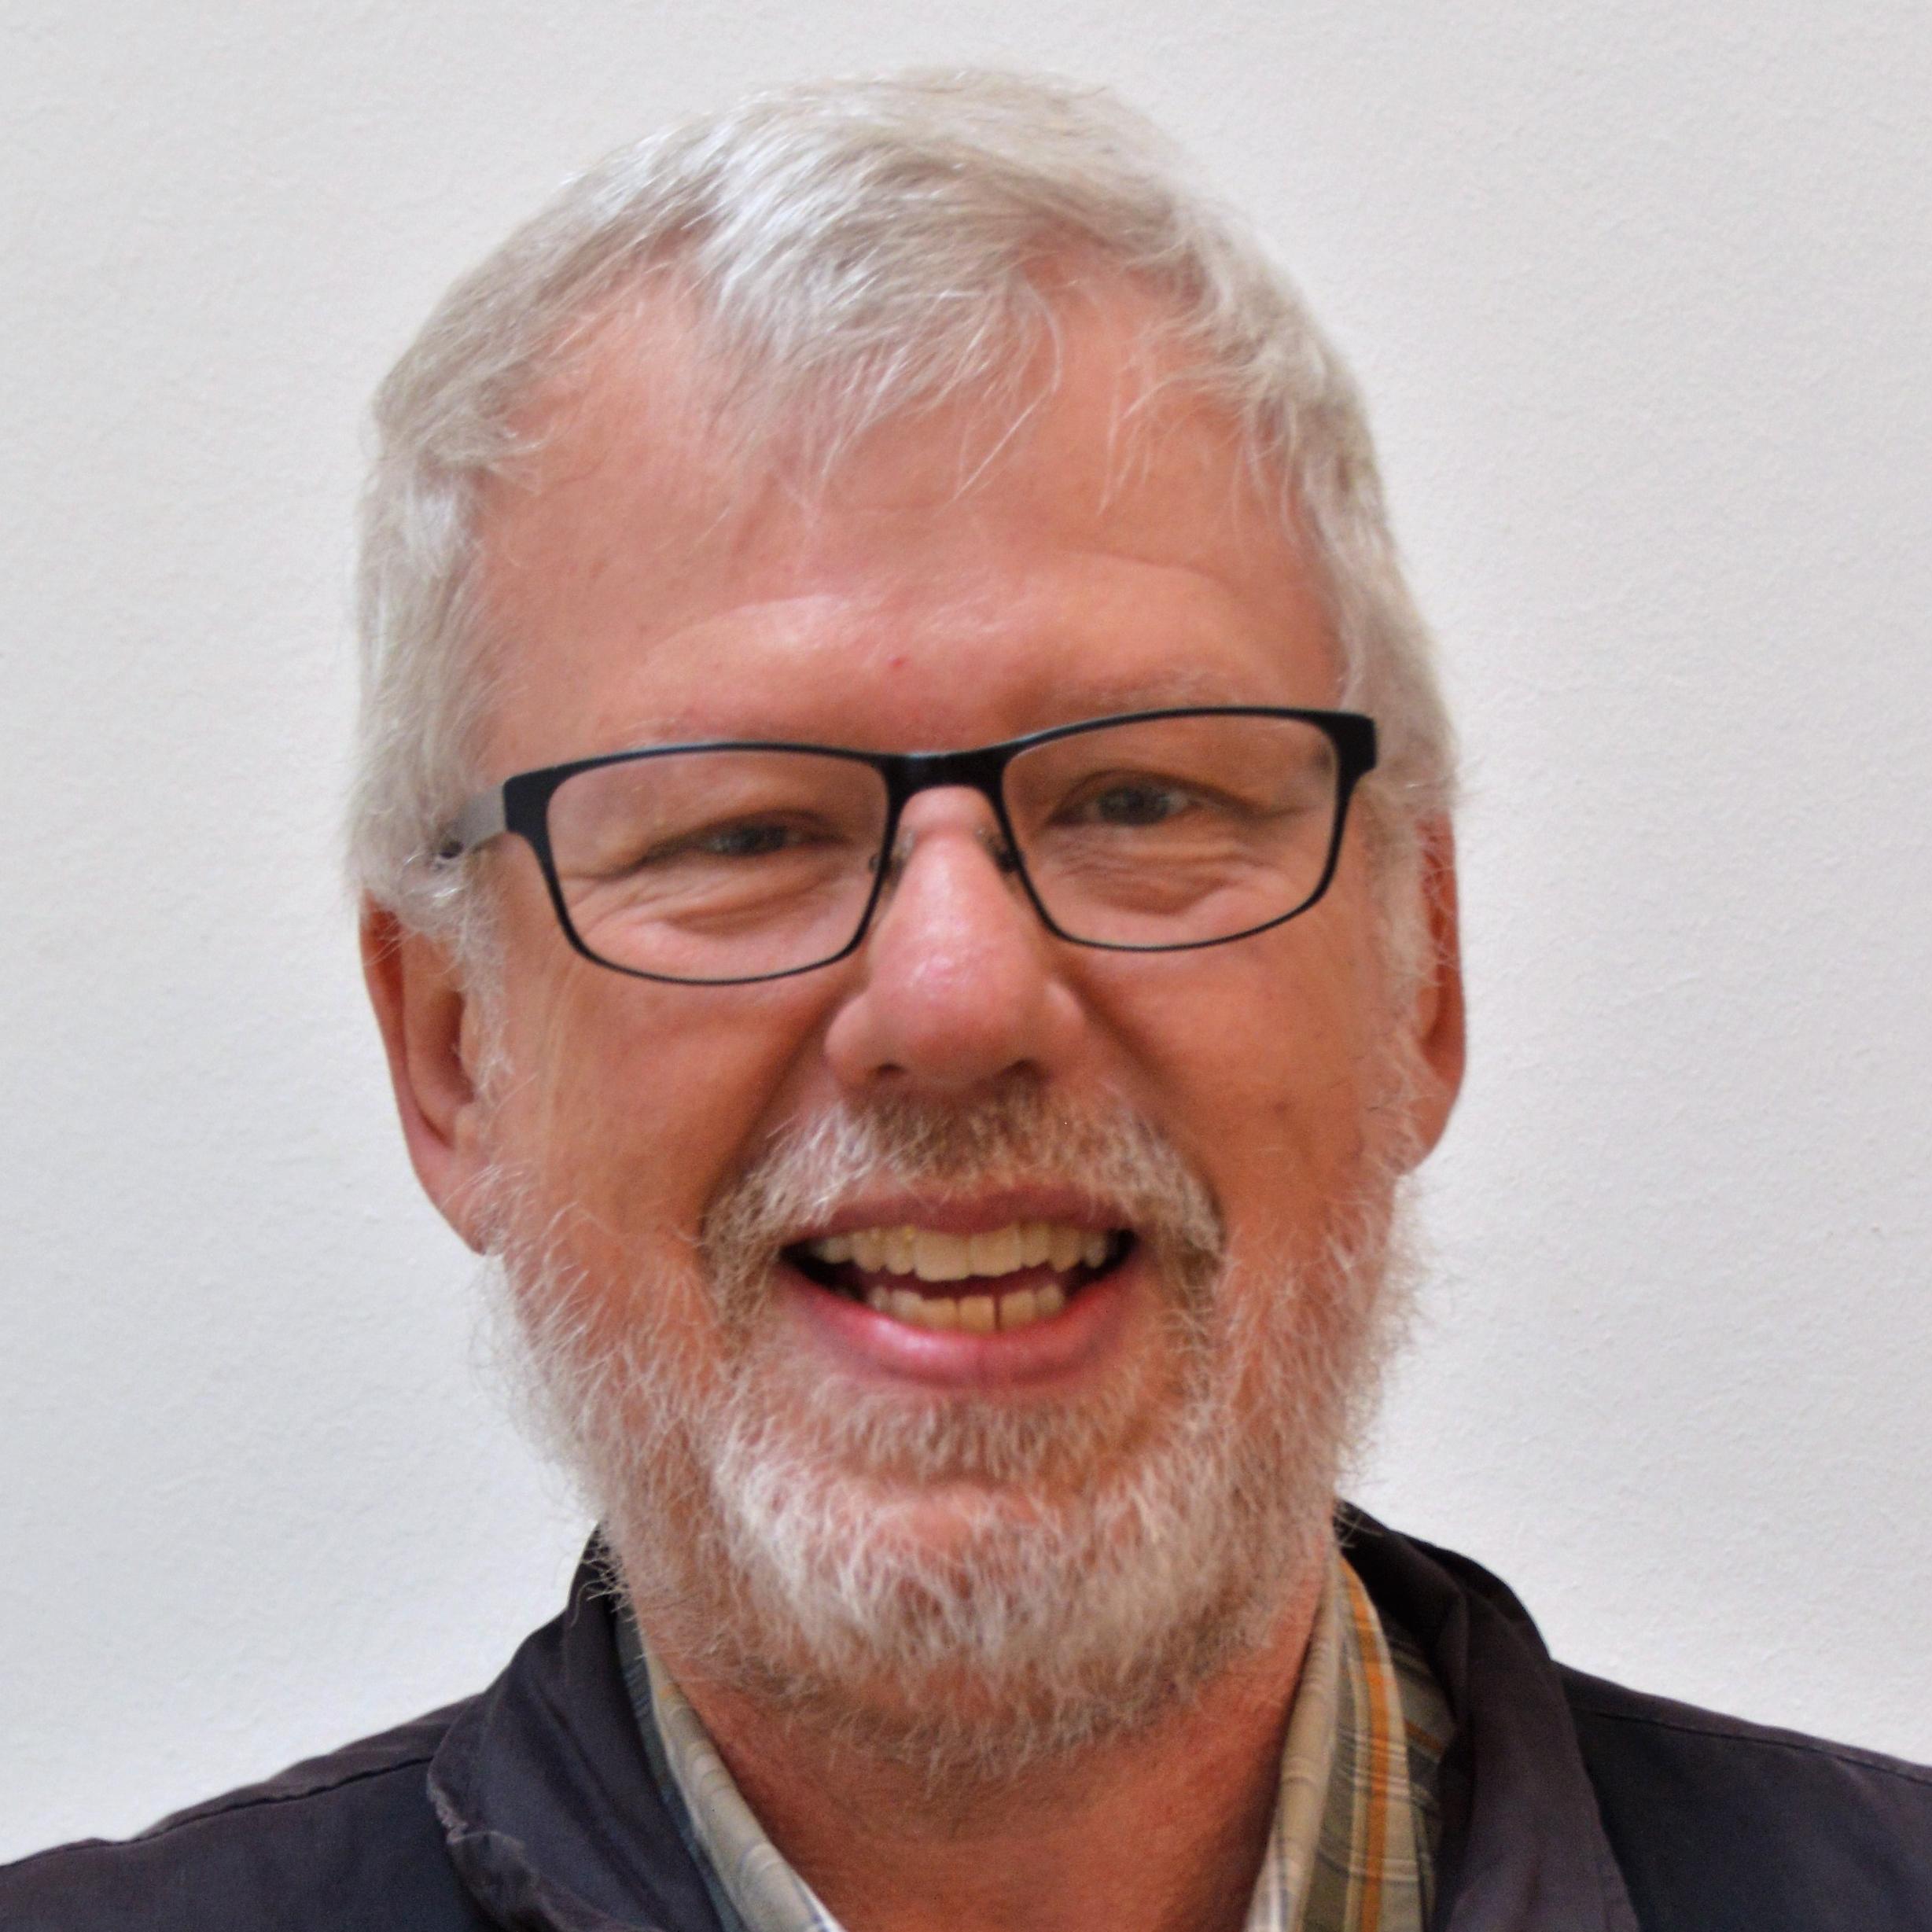 Ulrich Wolfgang Wendland